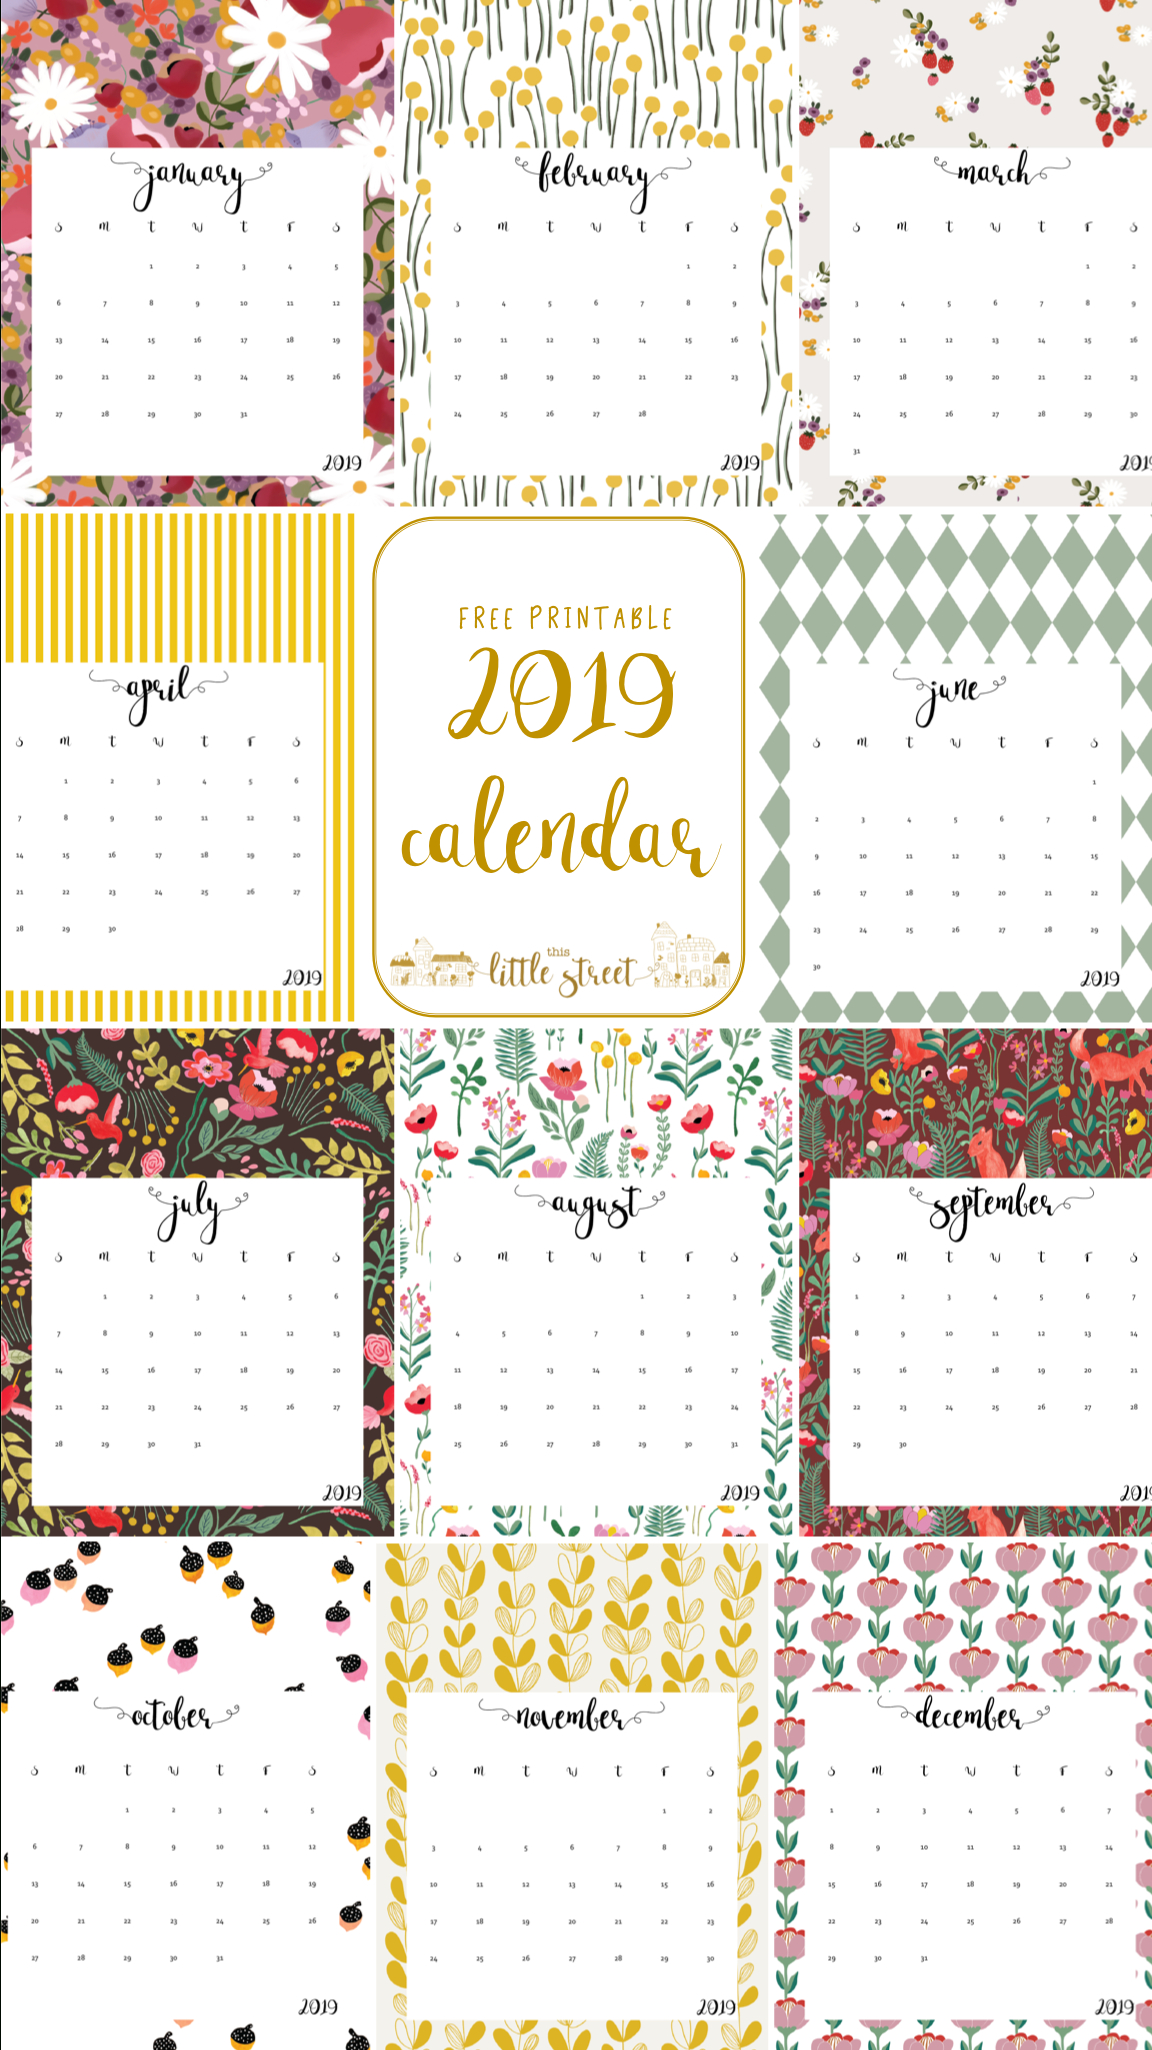 Free Printable 2019 Calendar. | Calendars | Free Printable Calendar throughout Homeschool Year At A Glance 2019-2020 Botanical Calendar Printable Free